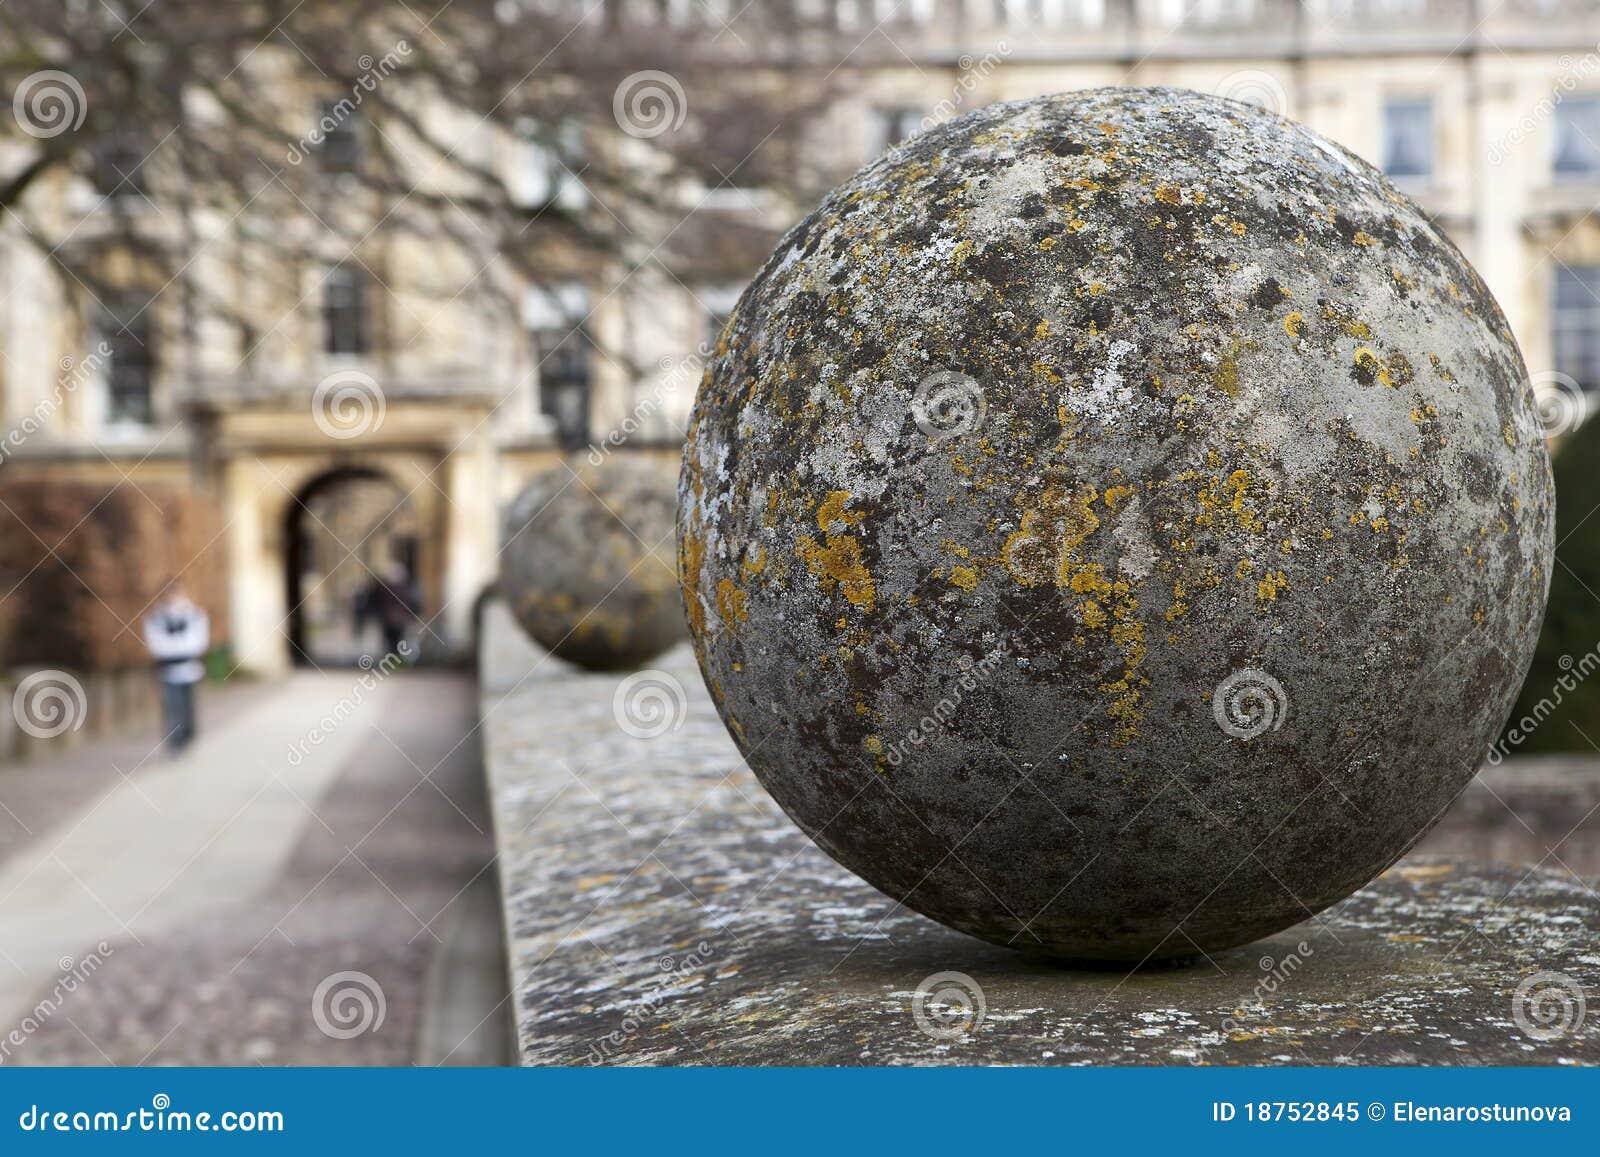 Decorative stone spheres royalty free stock photo image